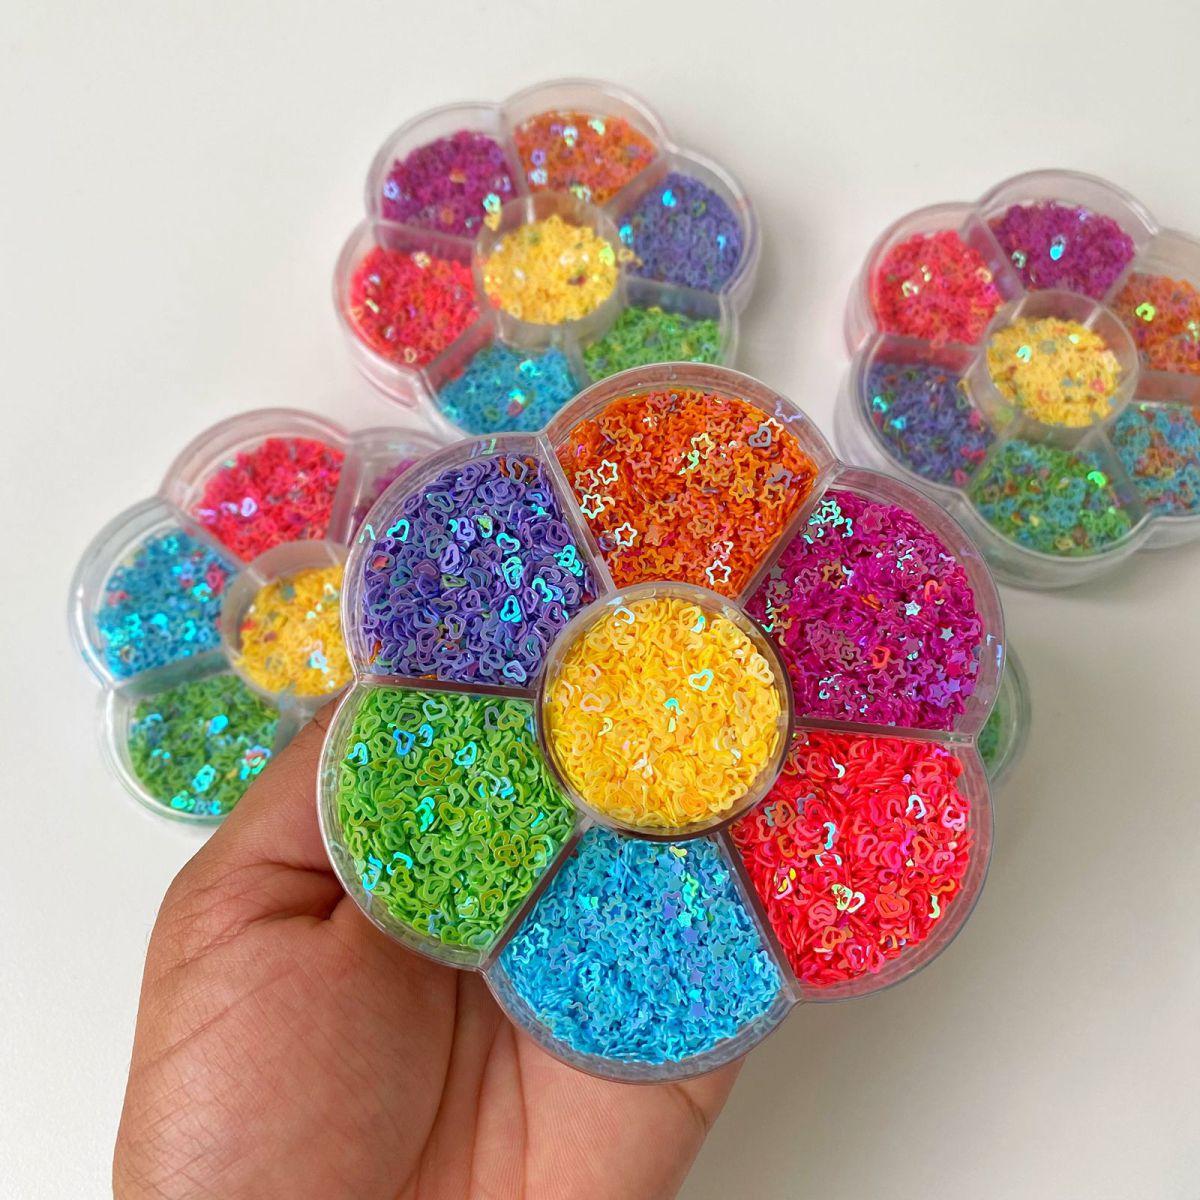 Flor de Glitter Brocal 7 Cores e Formatos Sprinkle Slime | Importado